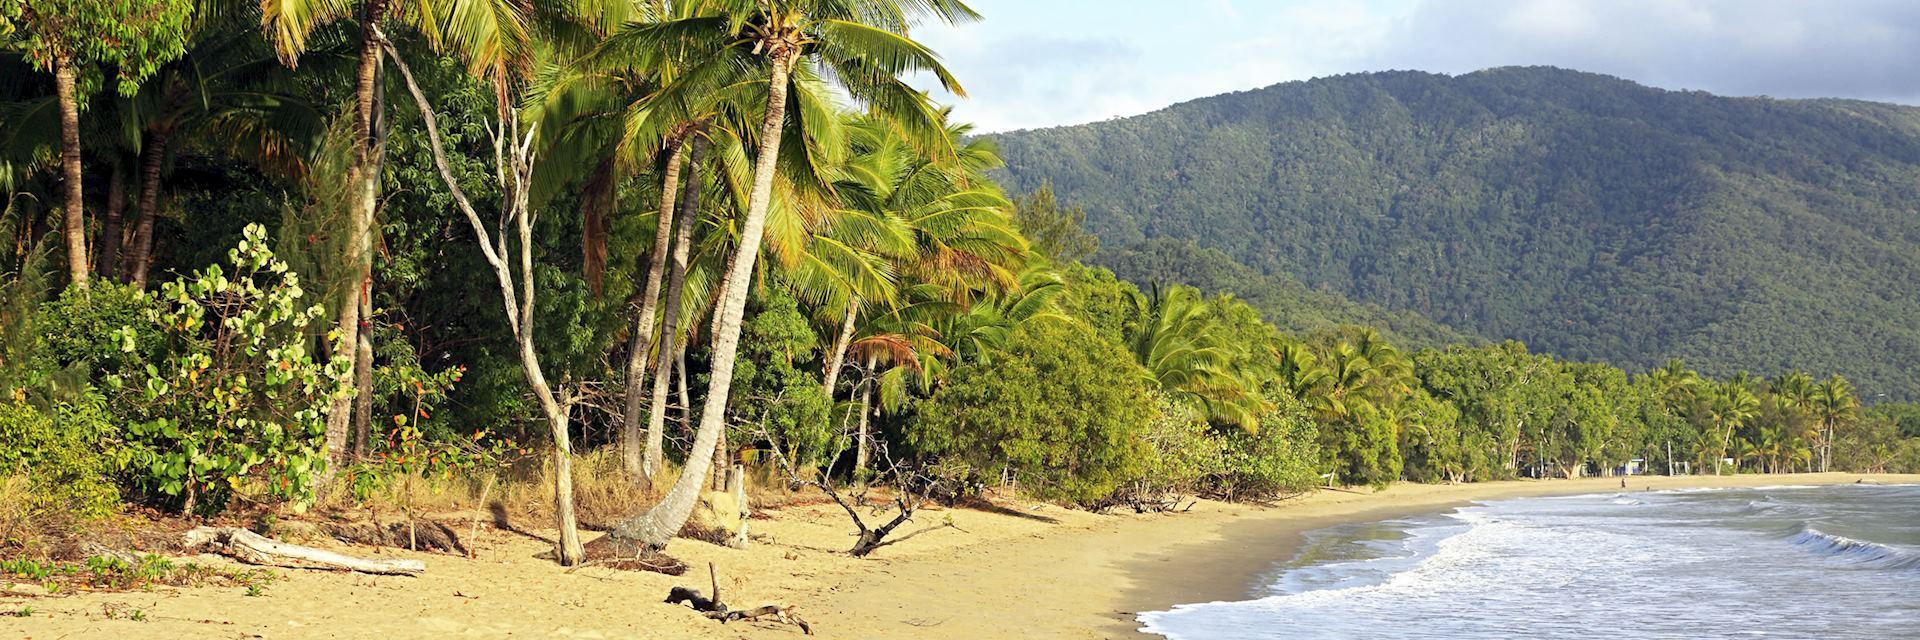 Palm Cove near Cairns